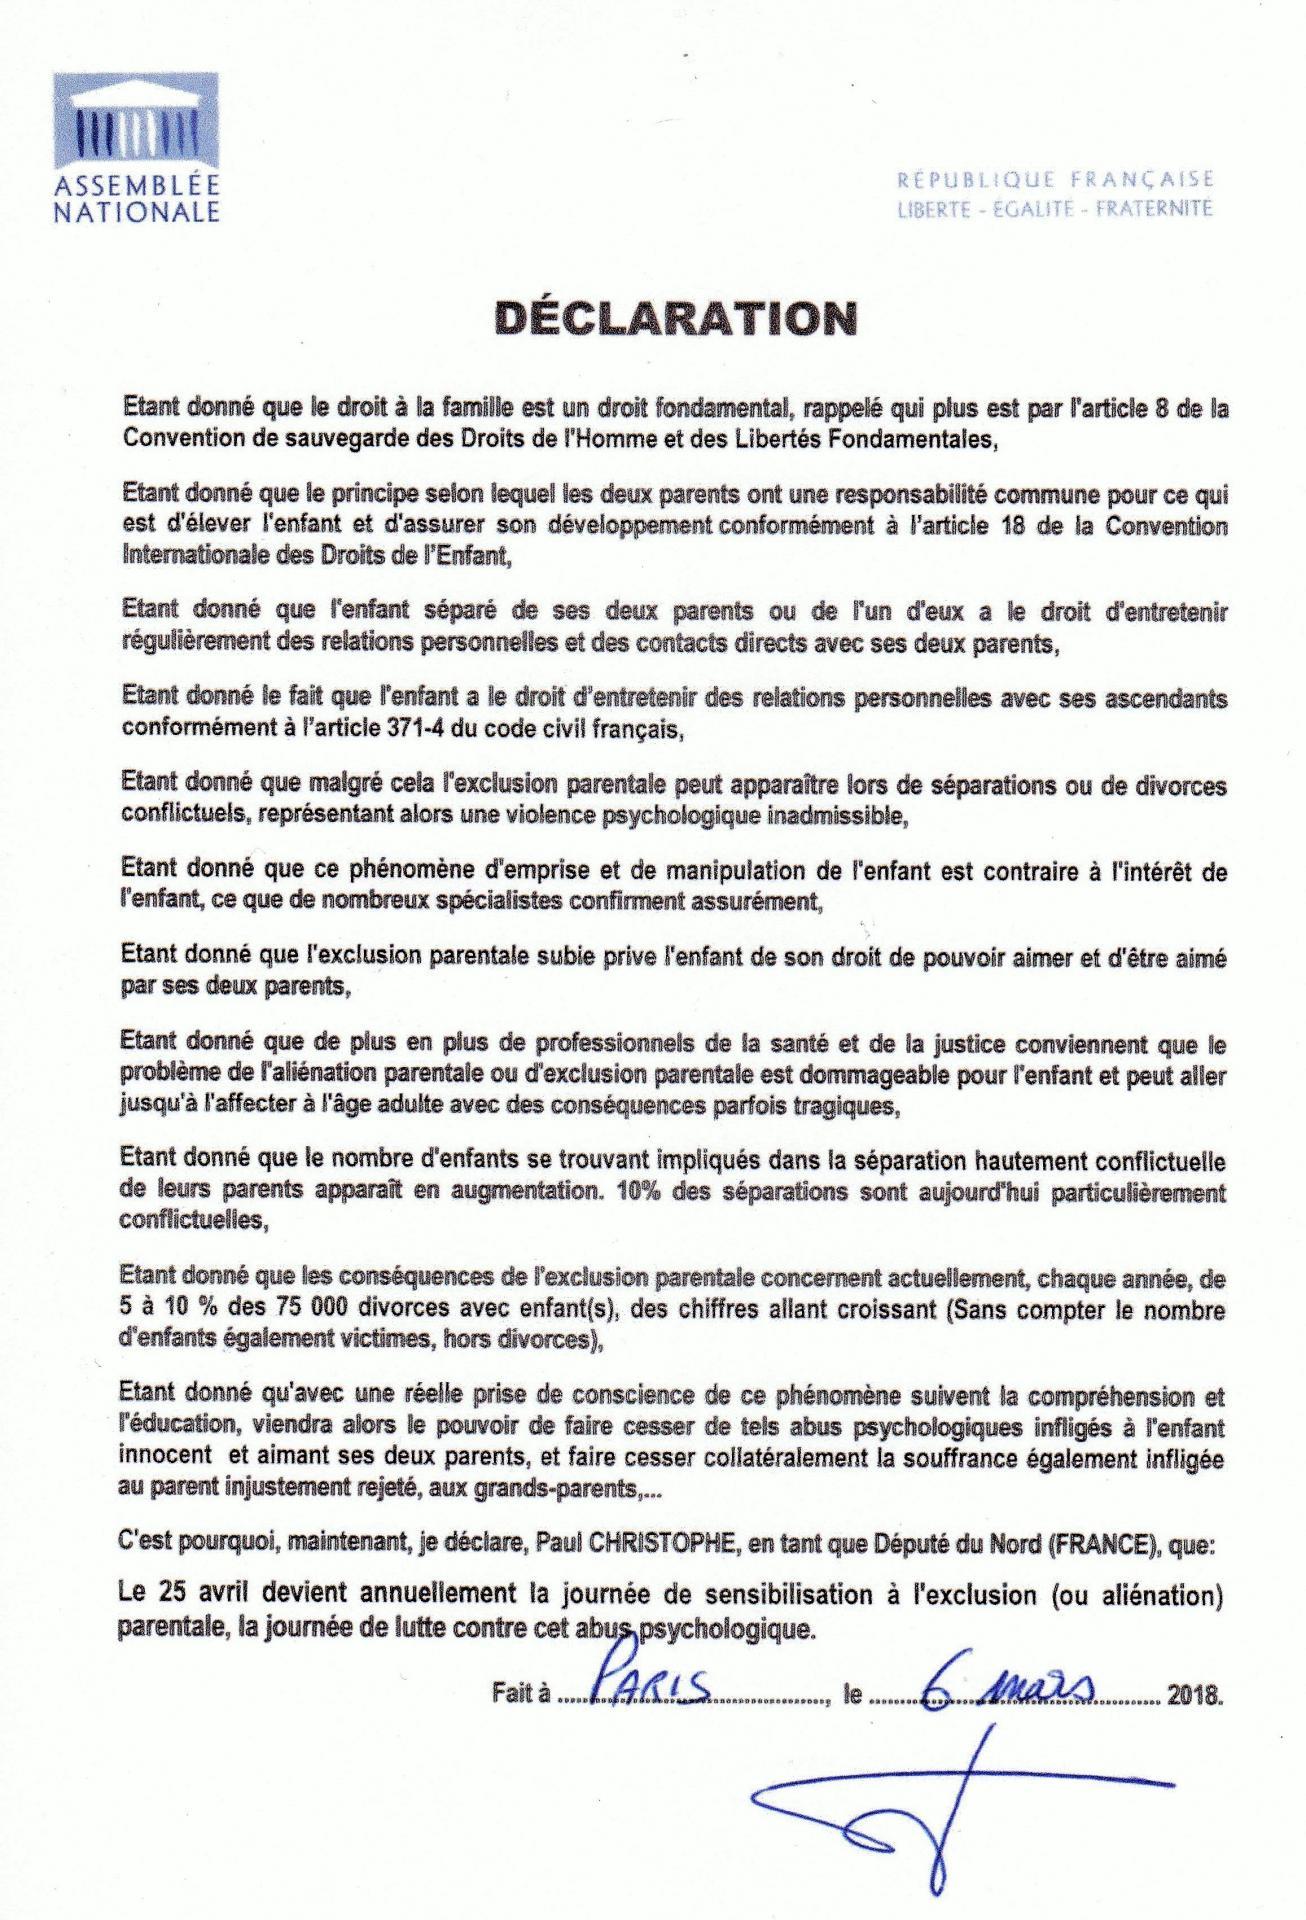 Paul christophe declaration 2018